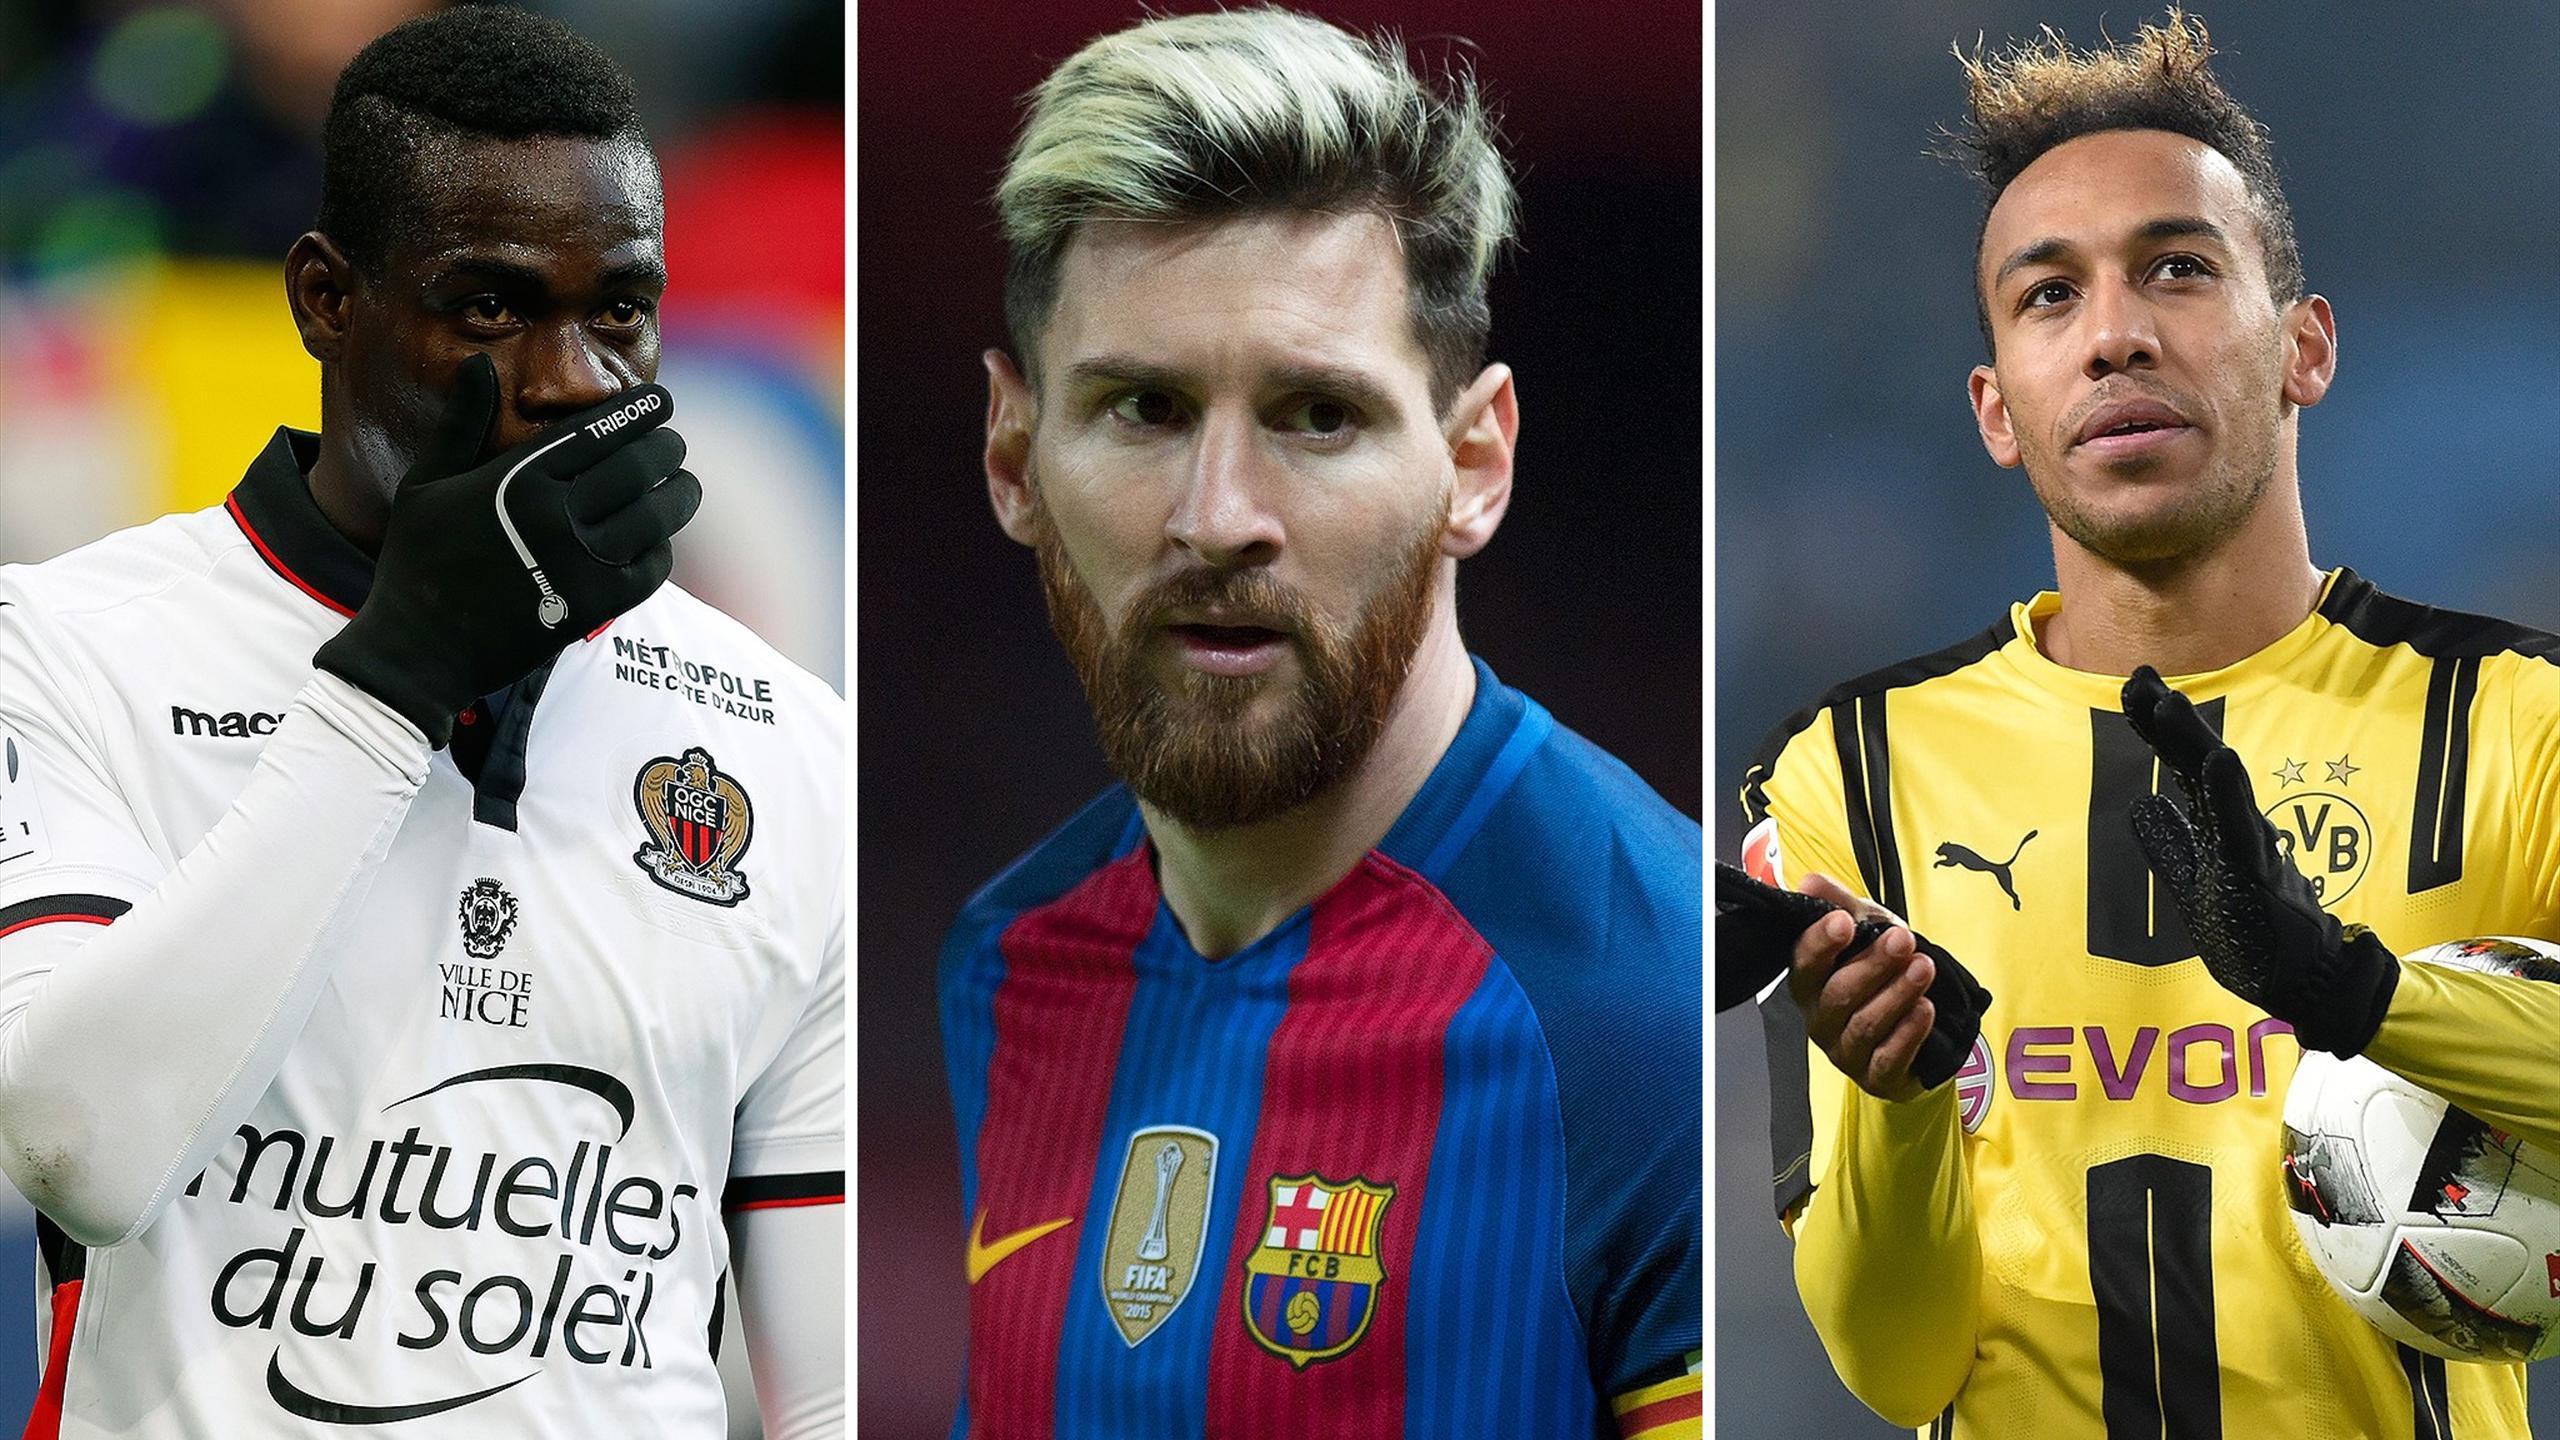 Mario Balotelli, Lionel Messi and Pierre-Emerick Aubameyang